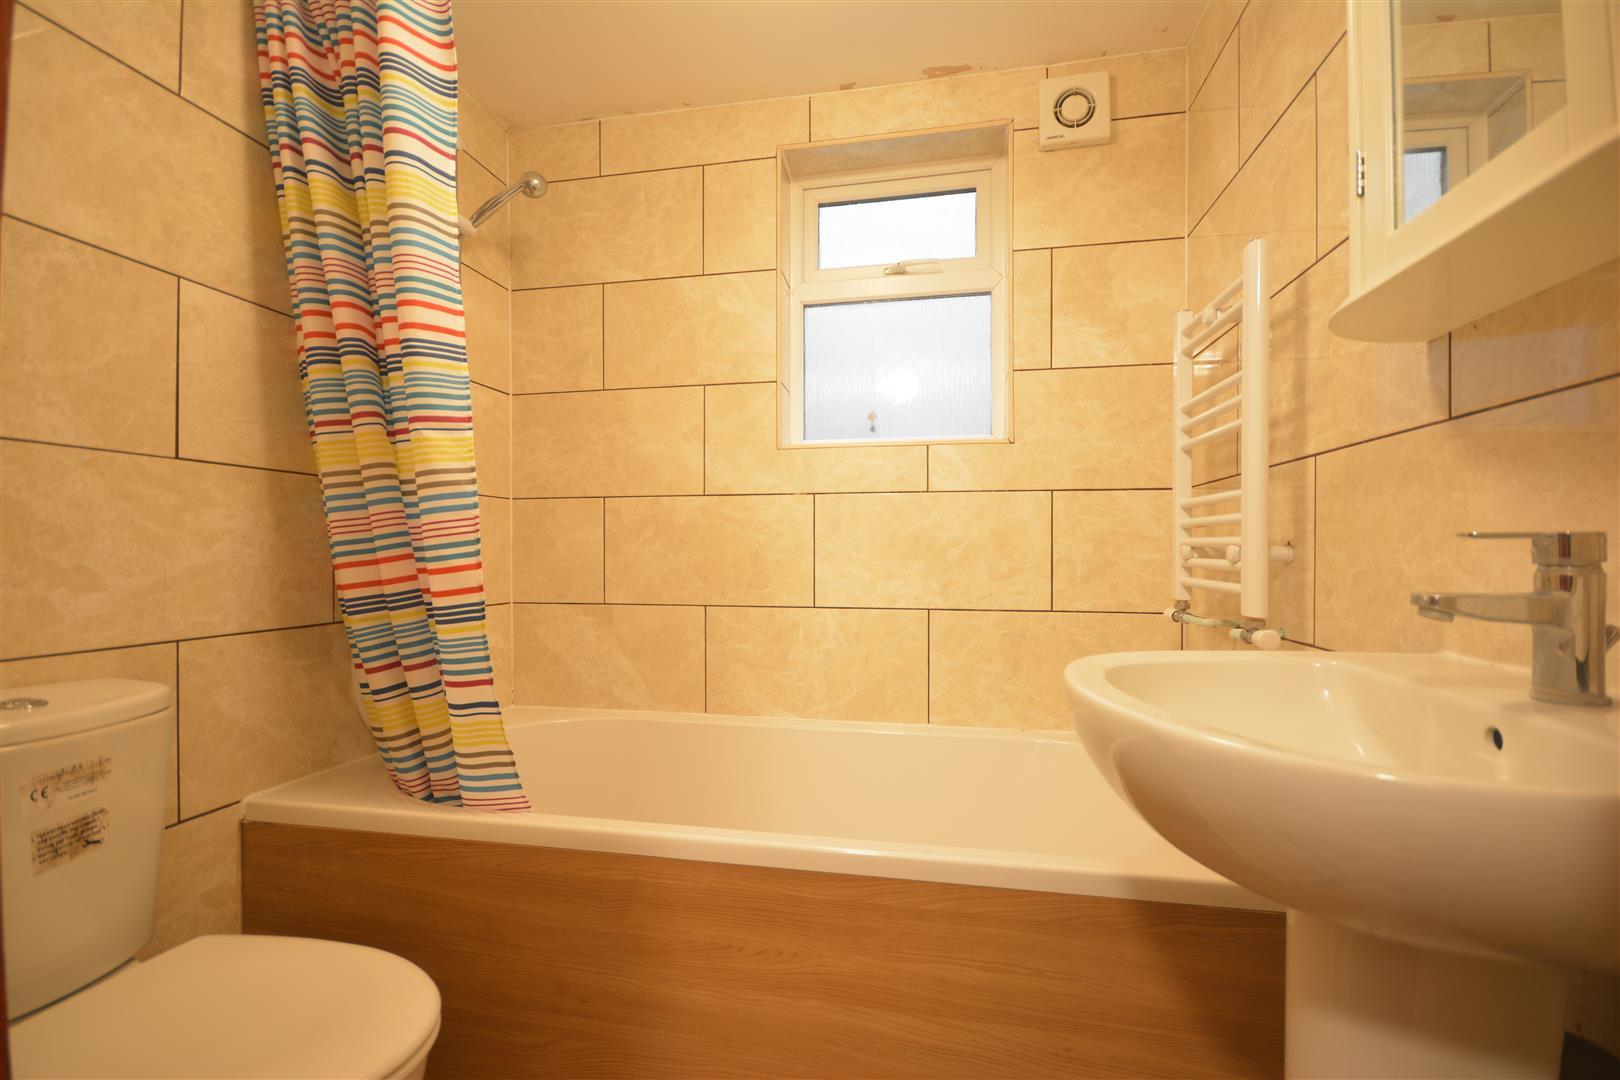 annex bathroom 1.JPG